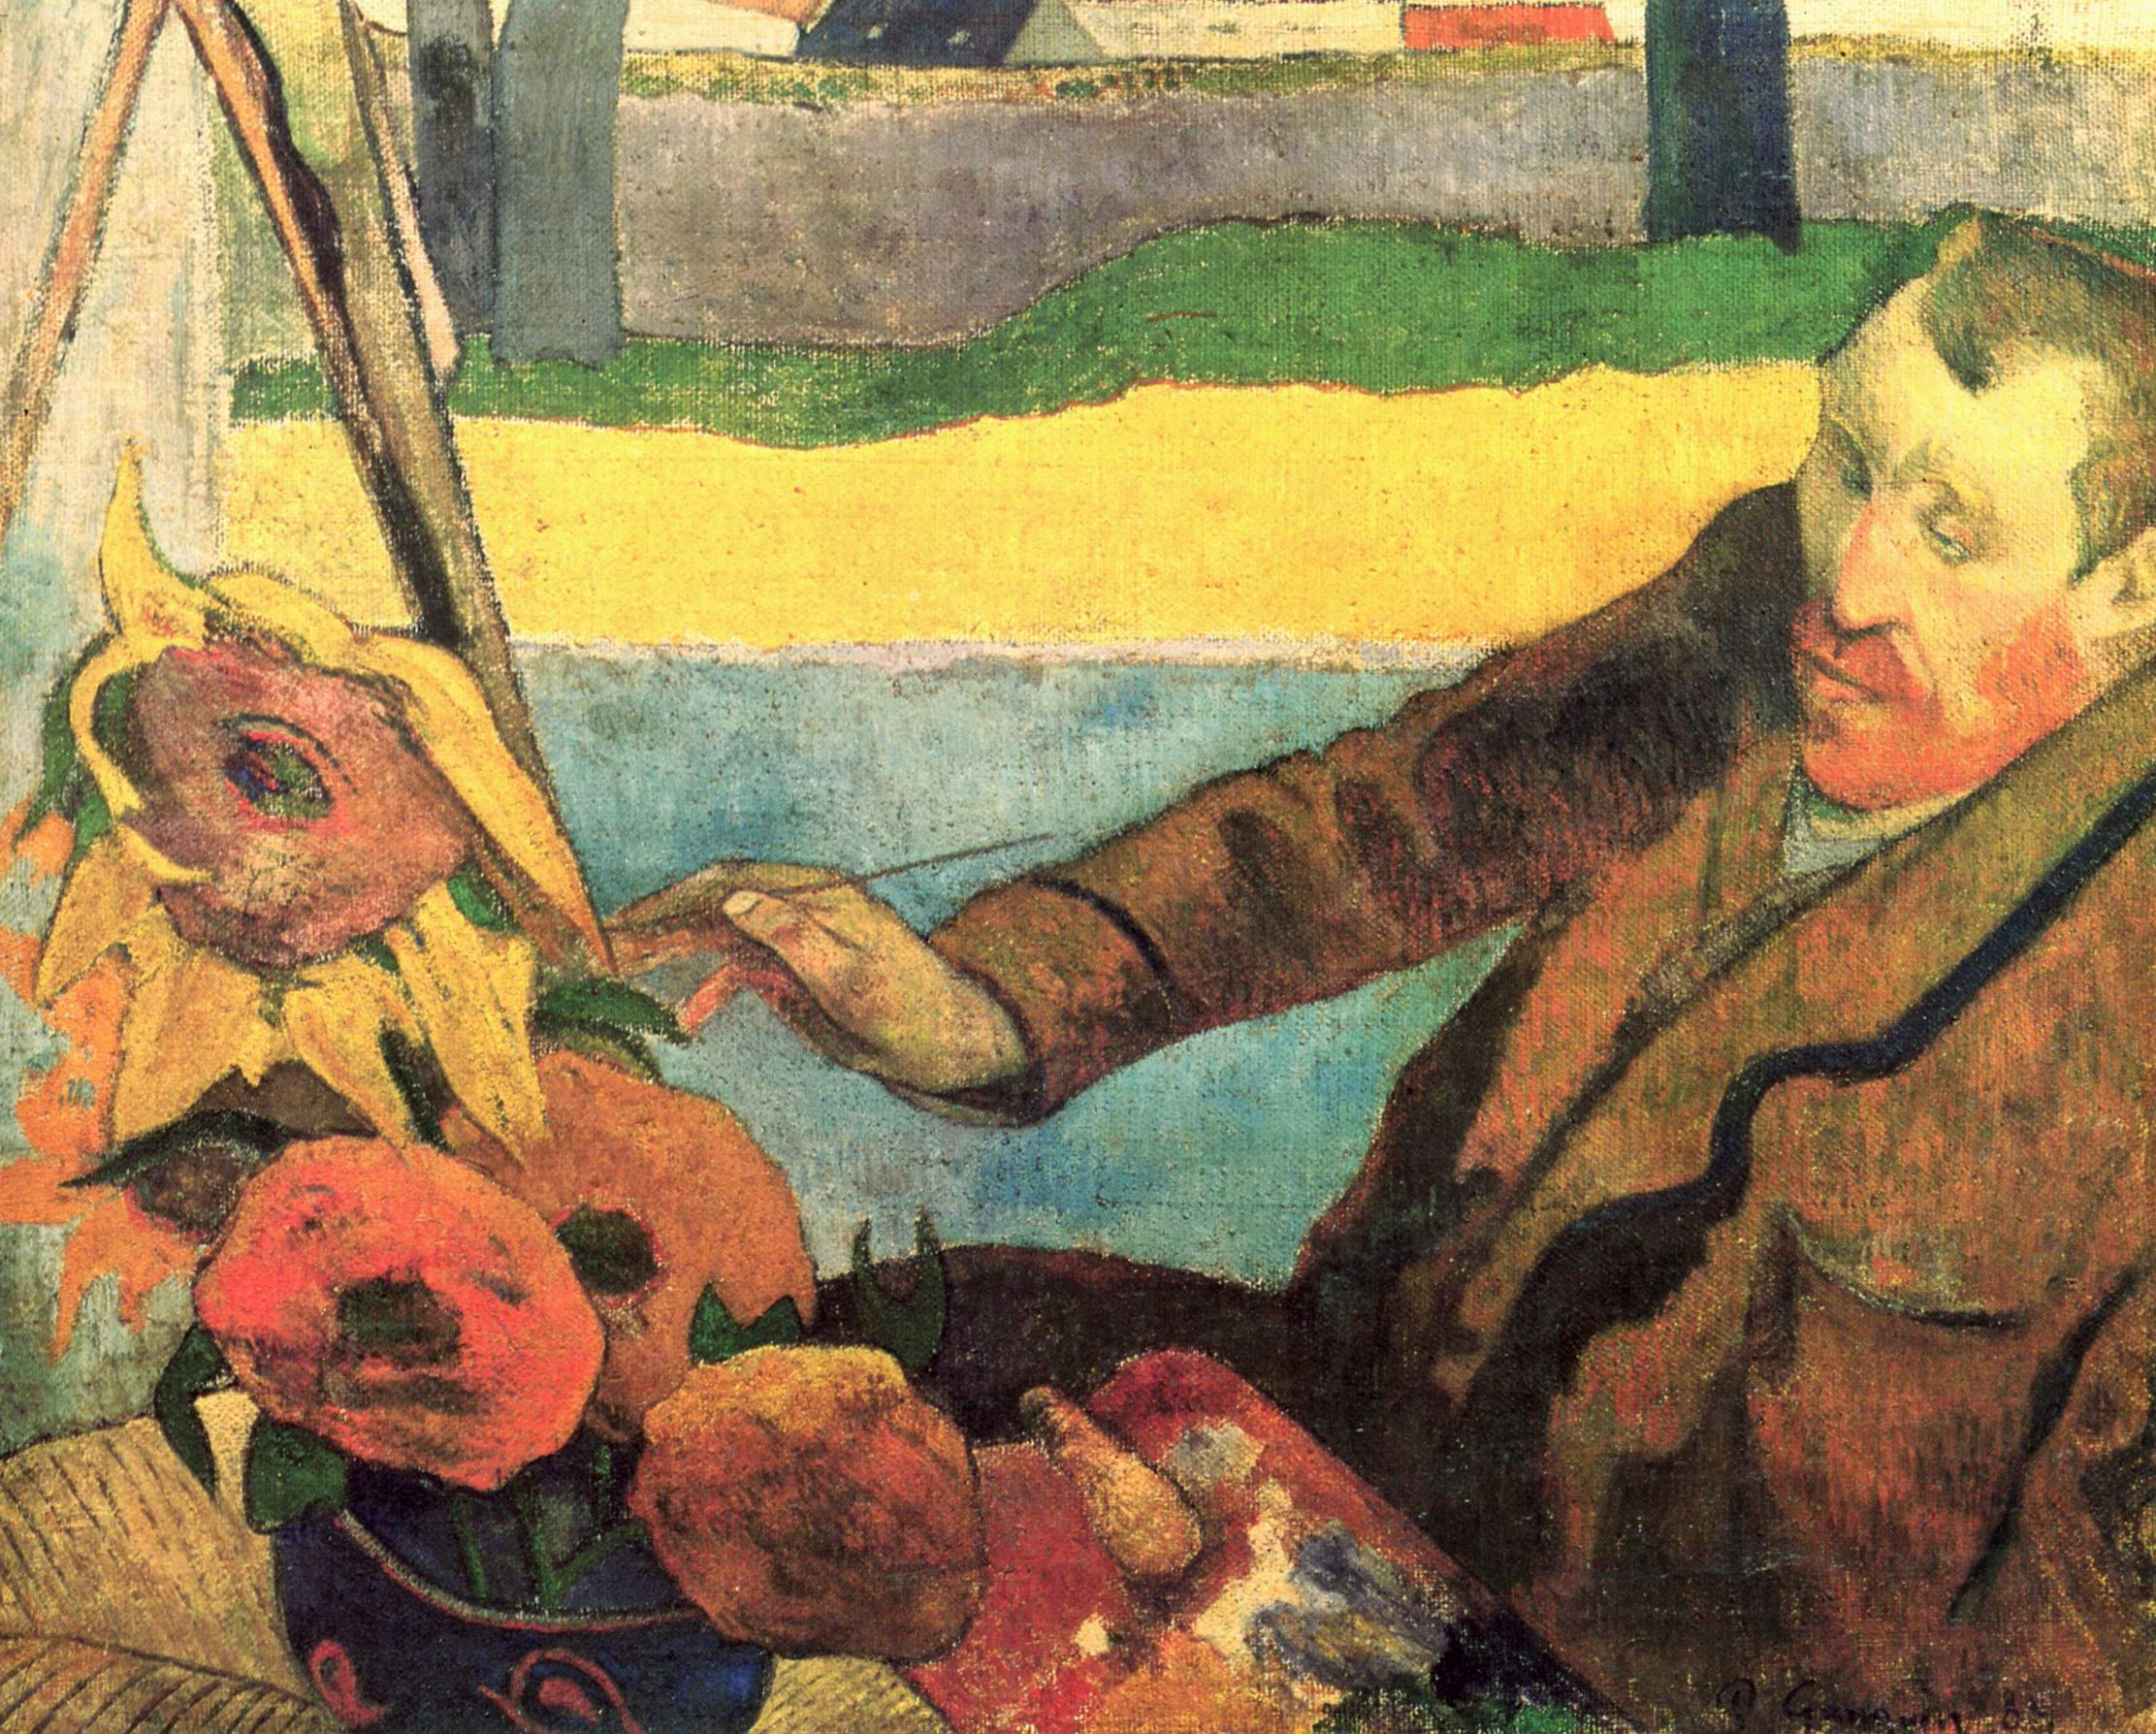 Портрет Винсента ван Гога, рисующего подсолнухи, Поль Гоген